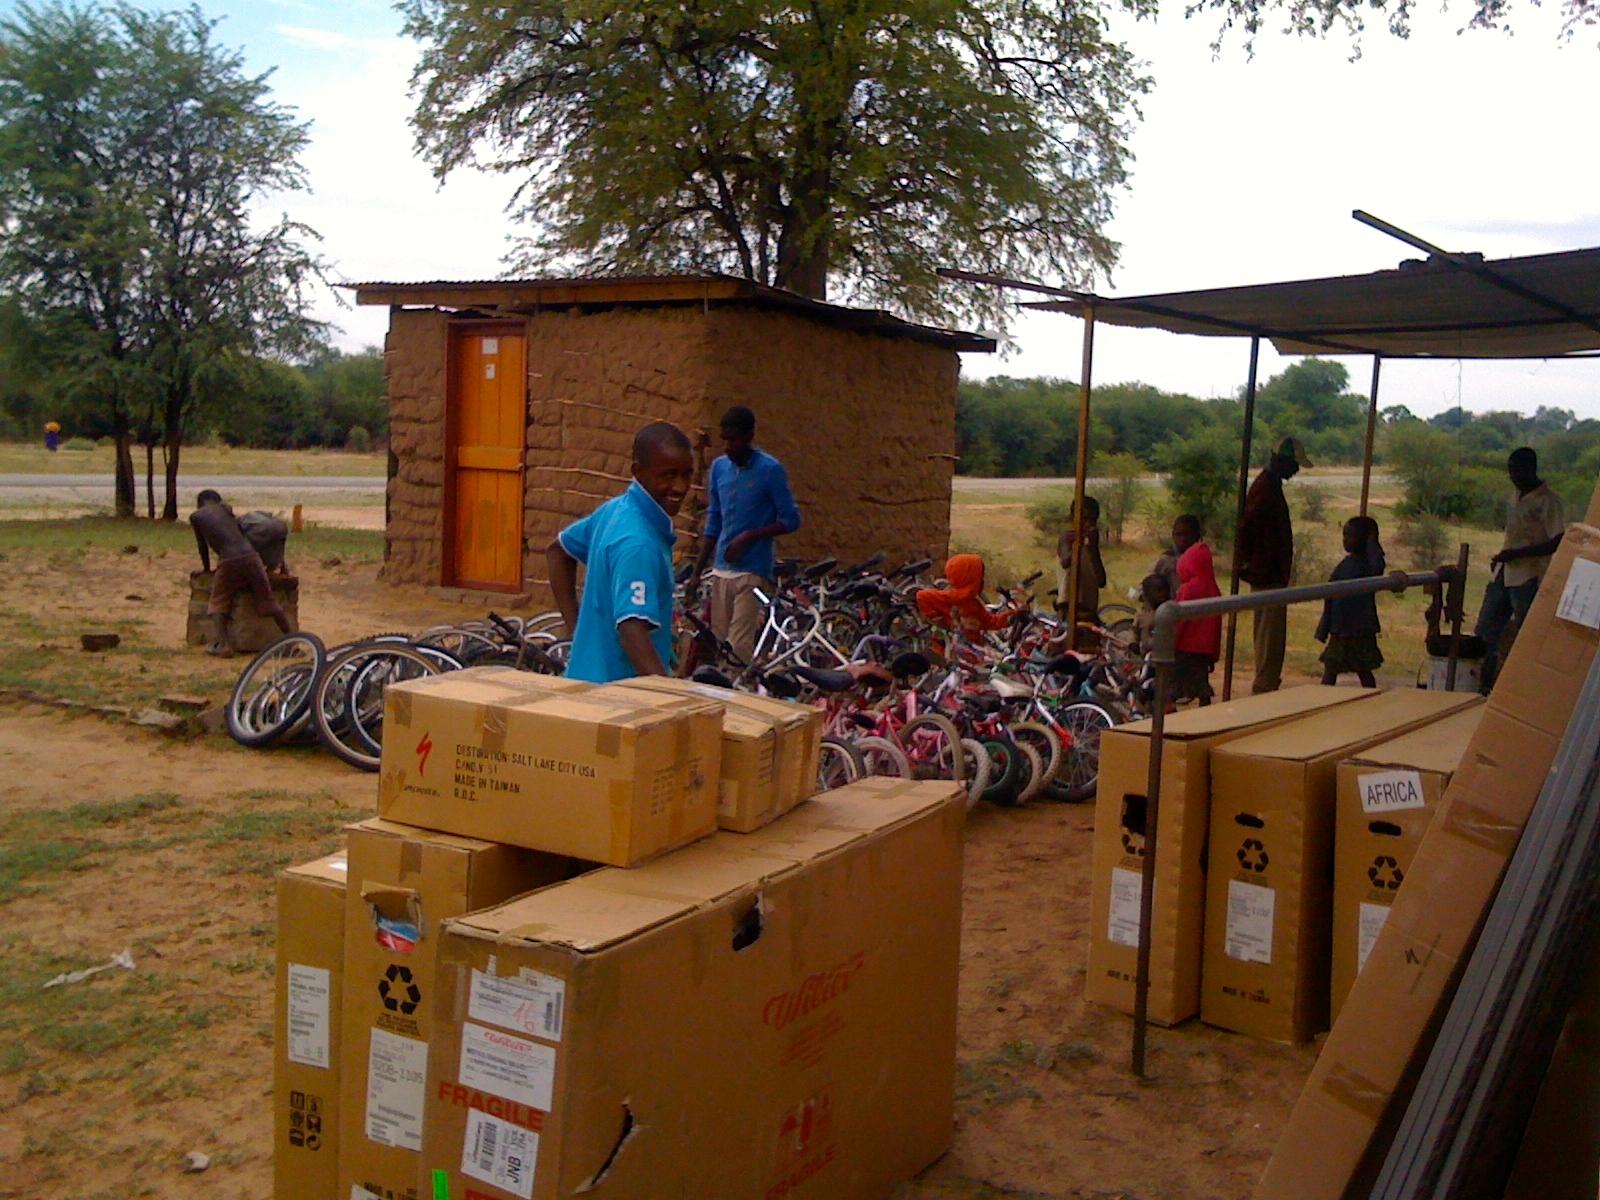 Unloading accessories at Meketo.